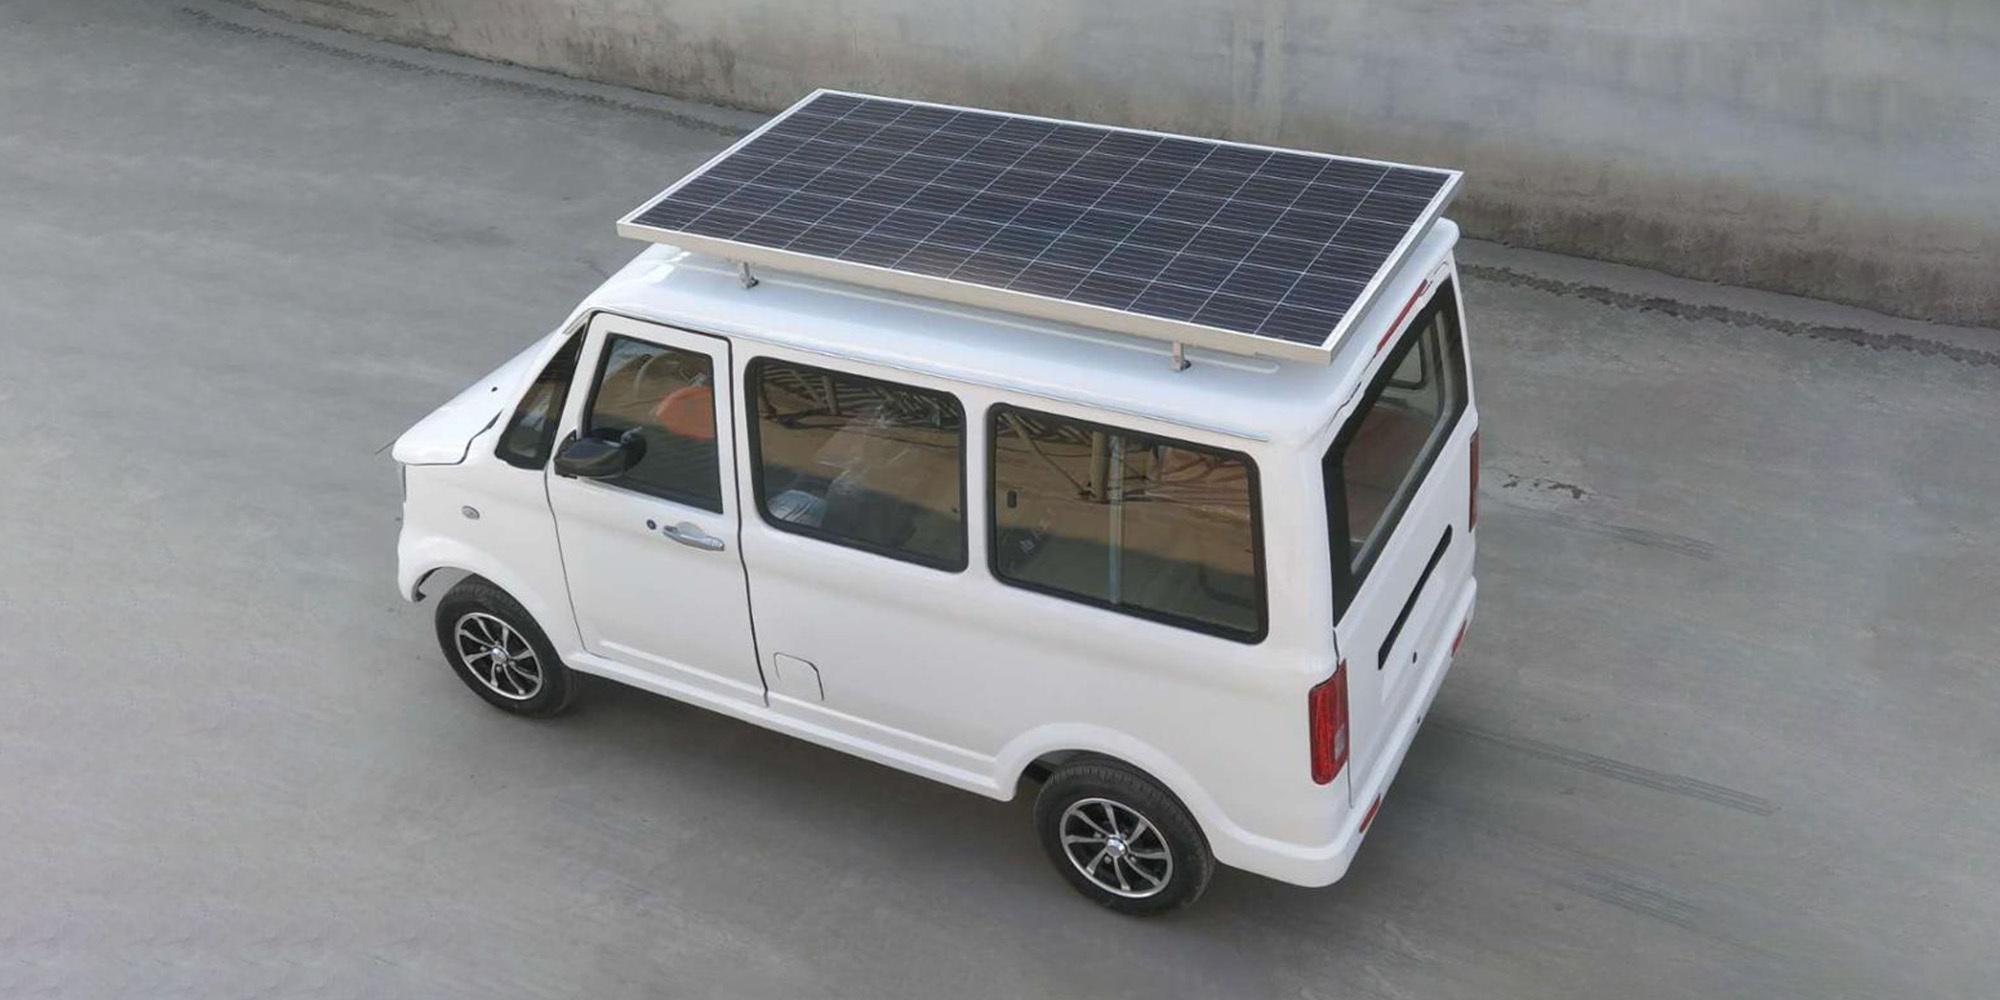 energia solar - energia limpa - mini van - ford -mercedes benz - painel solar